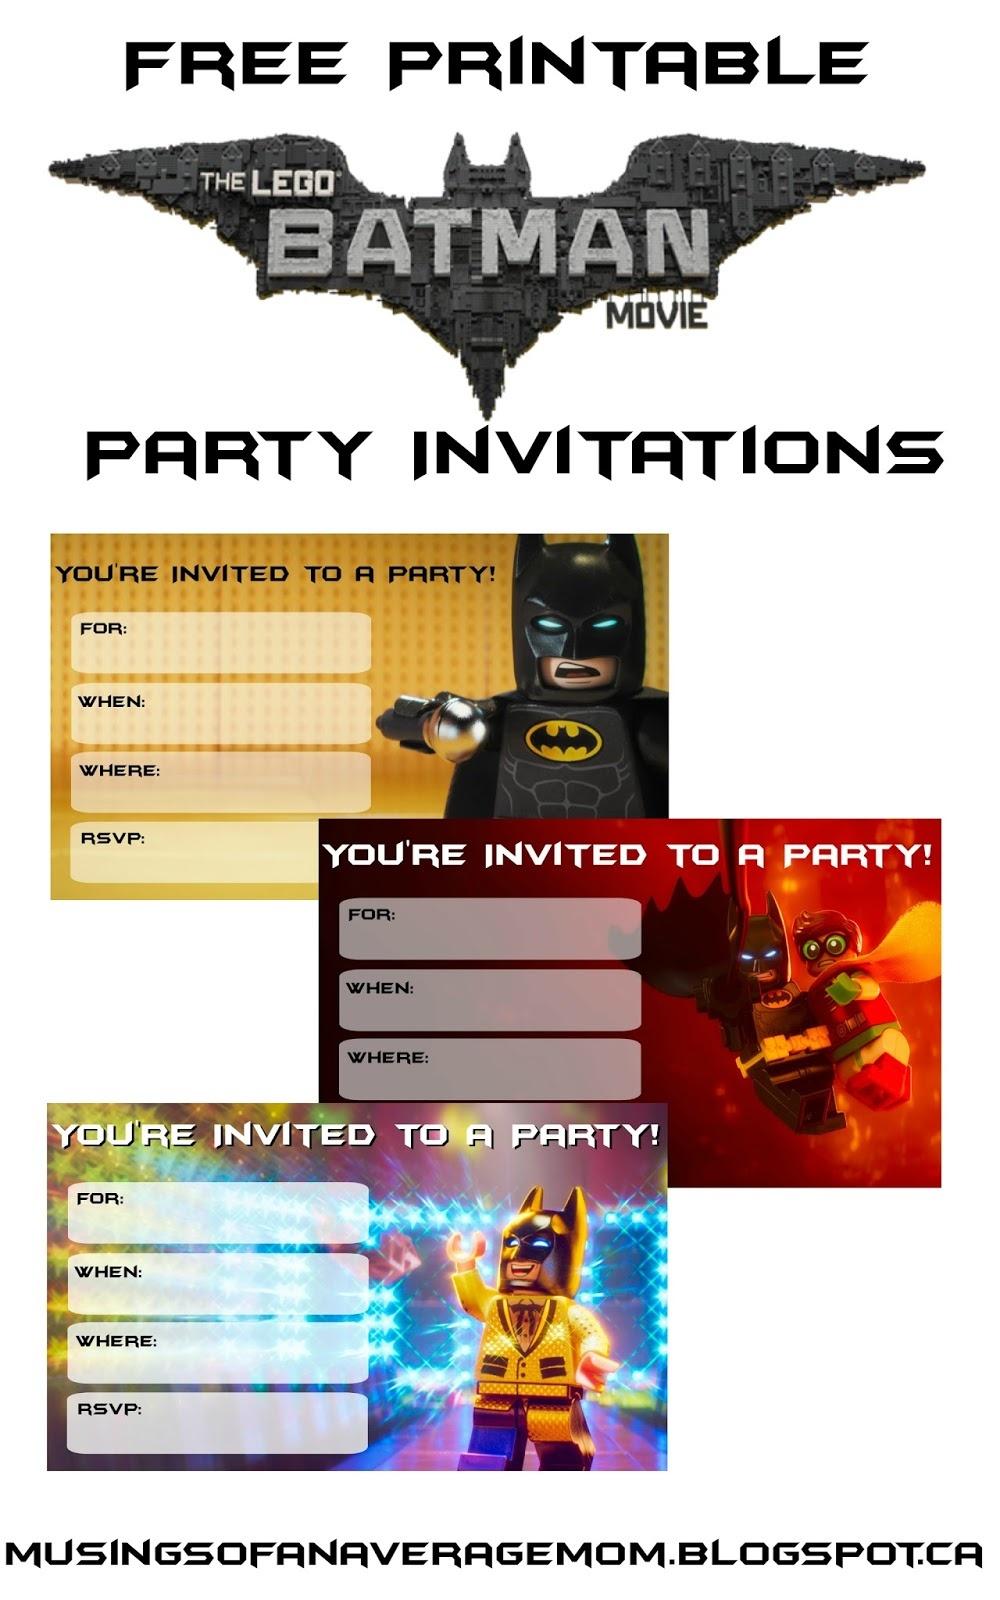 Musings Of An Average Mom: Lego Batman Movie Party Invitations - Lego Batman Party Invitations Free Printable